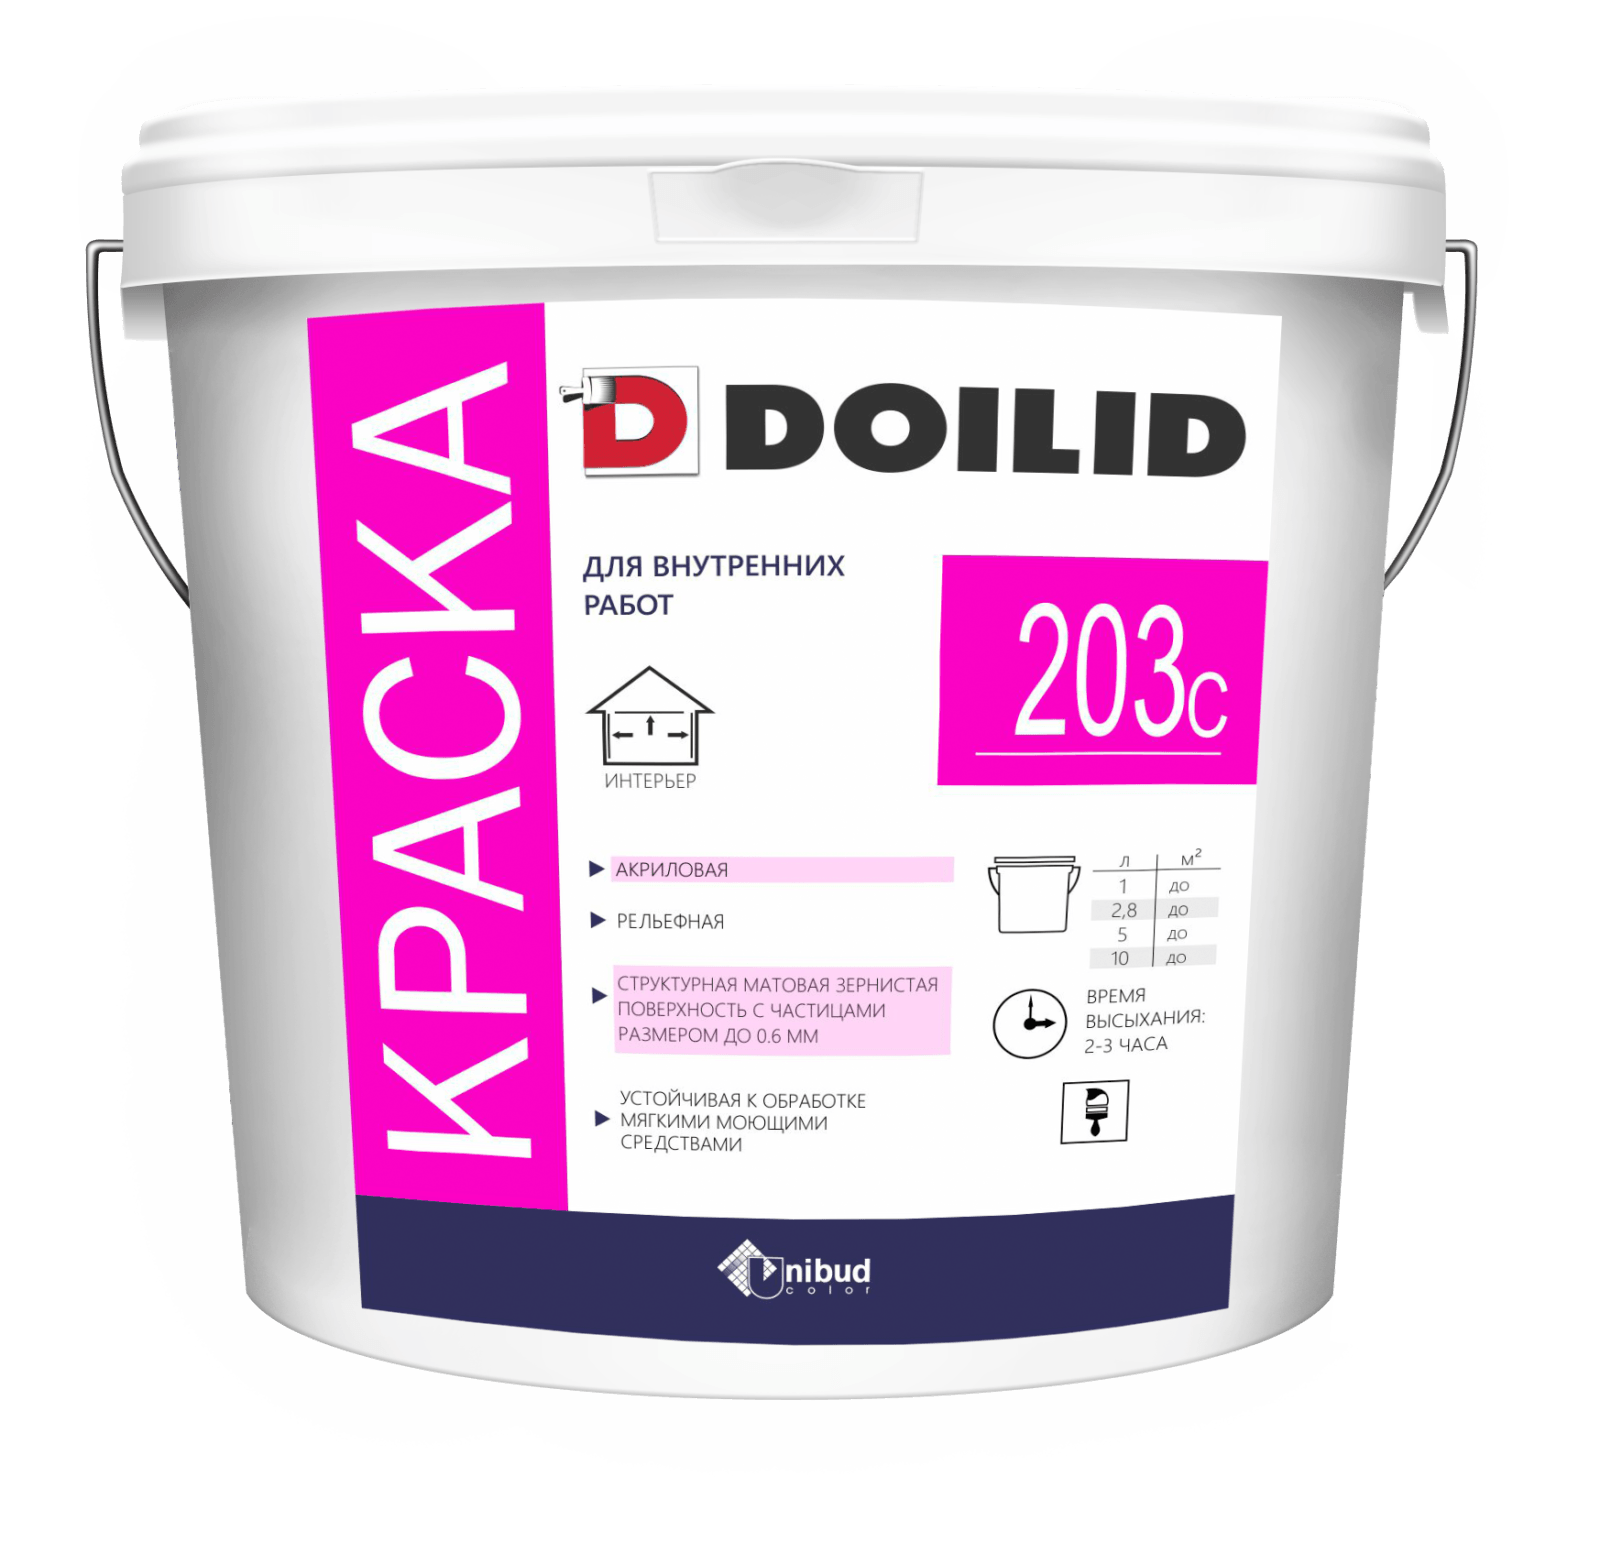 Doilid ВД-АК-203C